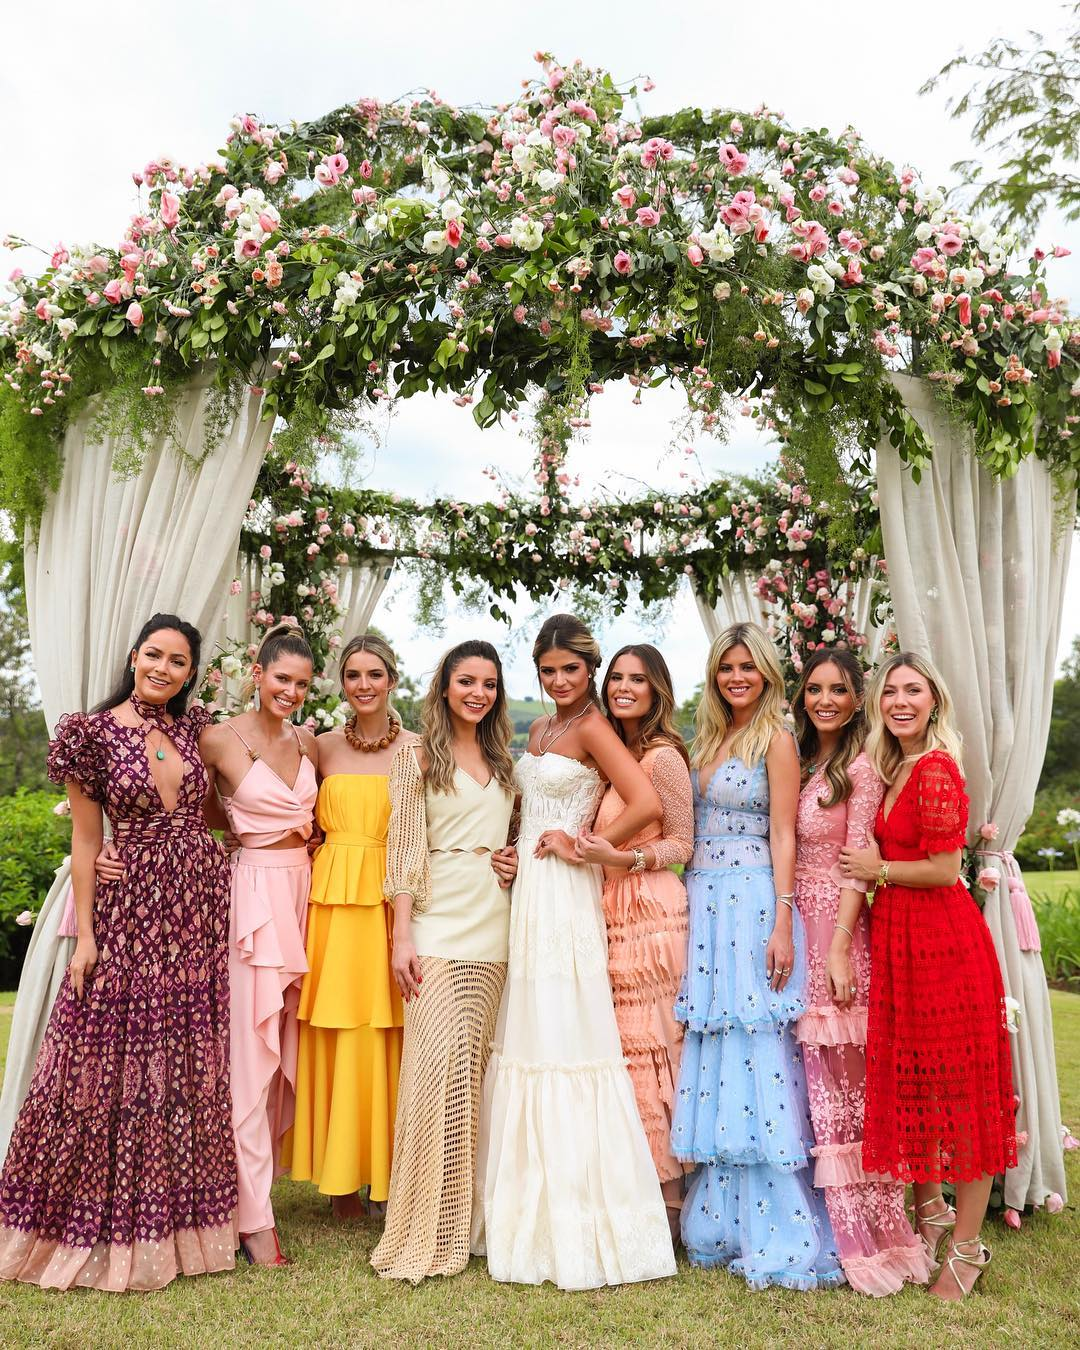 noivado de Thassia Naves convidados